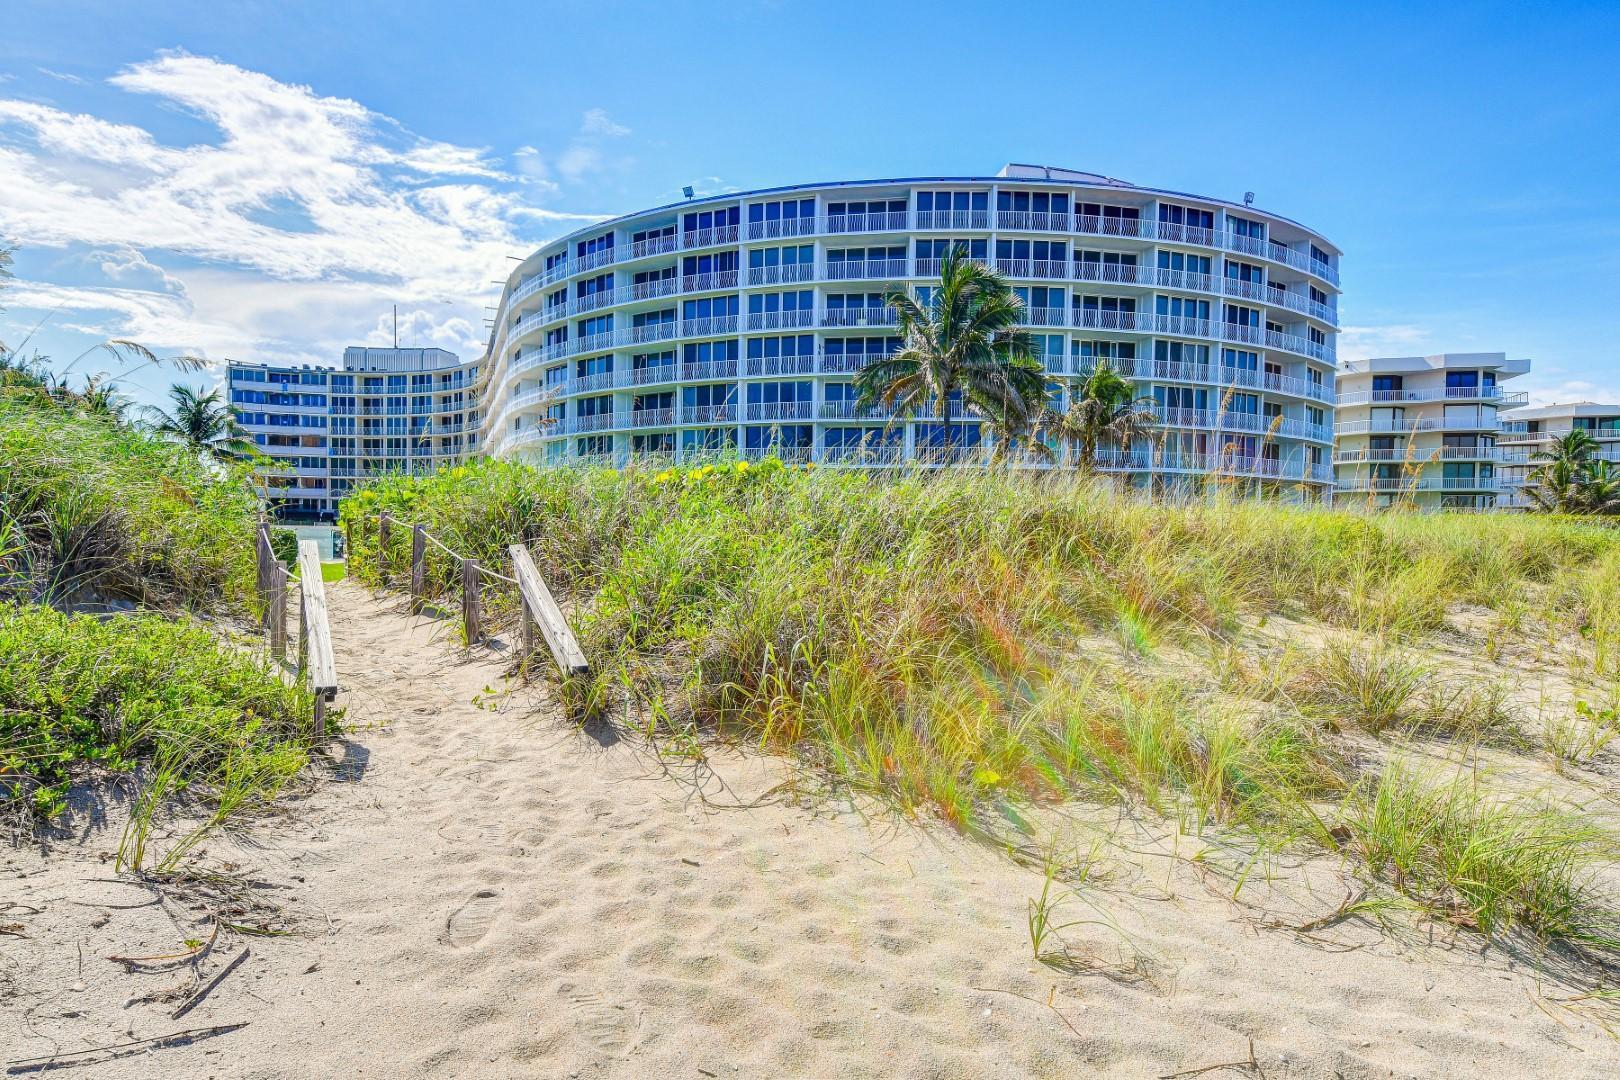 AMBASSADOR PALM BEACH FLORIDA